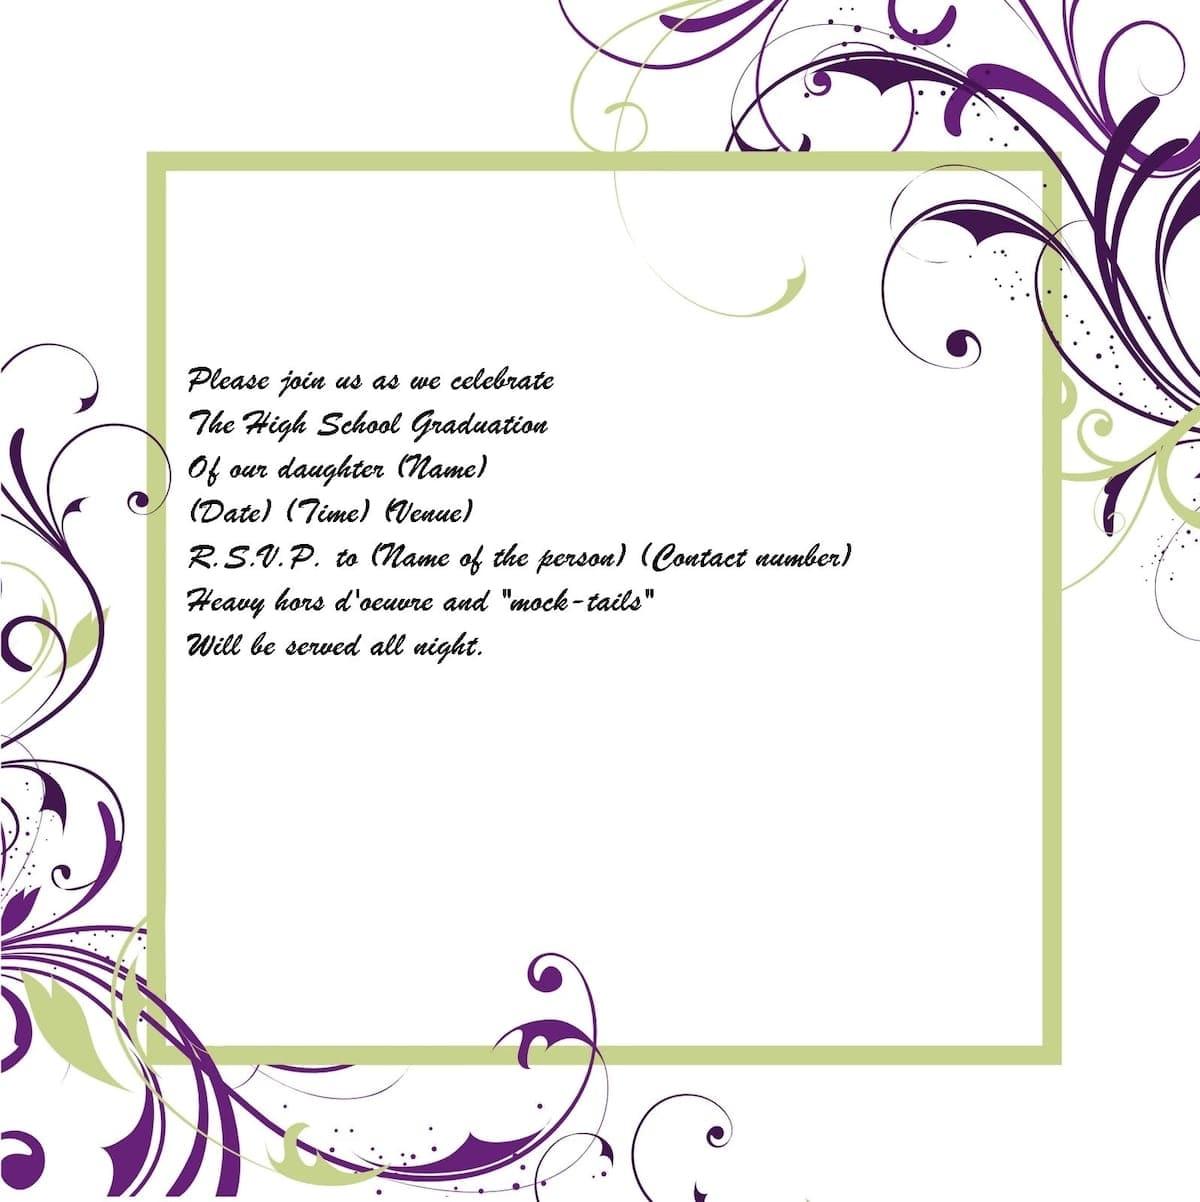 Congratulatory messages on graduation, Best graduation invitation messages, Graduation day messages